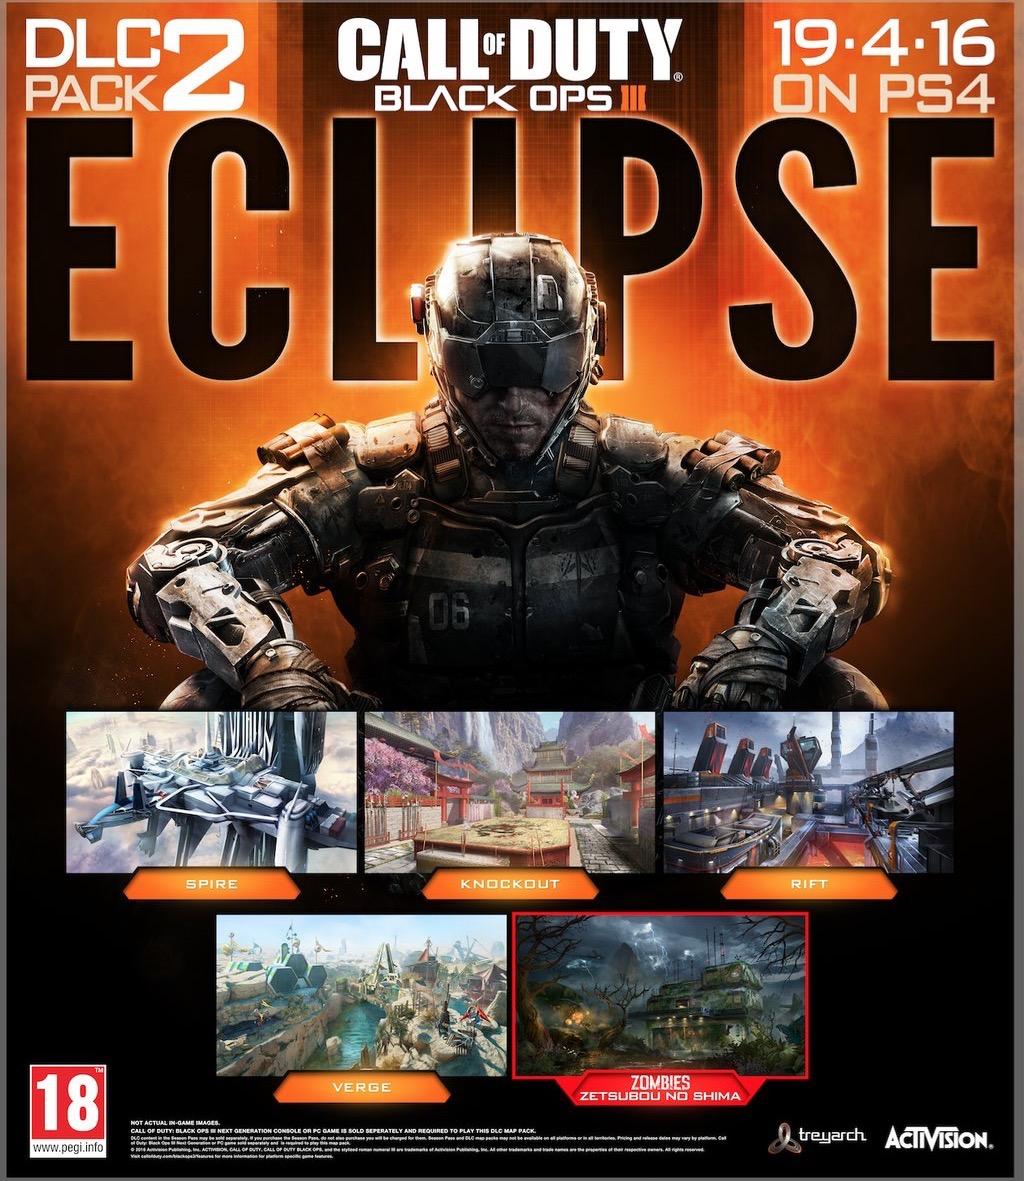 Eclipse-DLC_2-Black-Ops-3